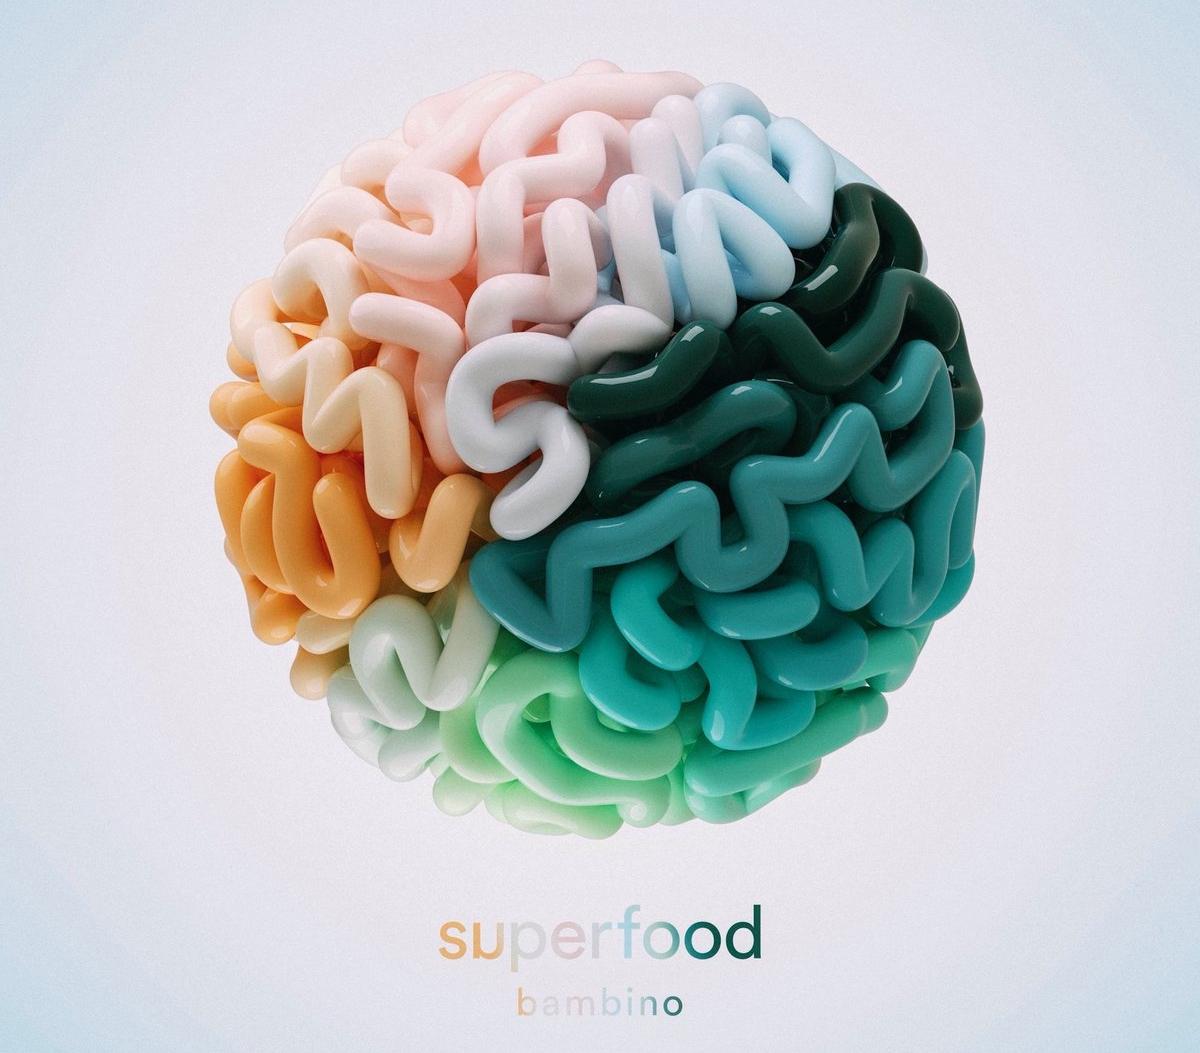 Superfood … stimulating.